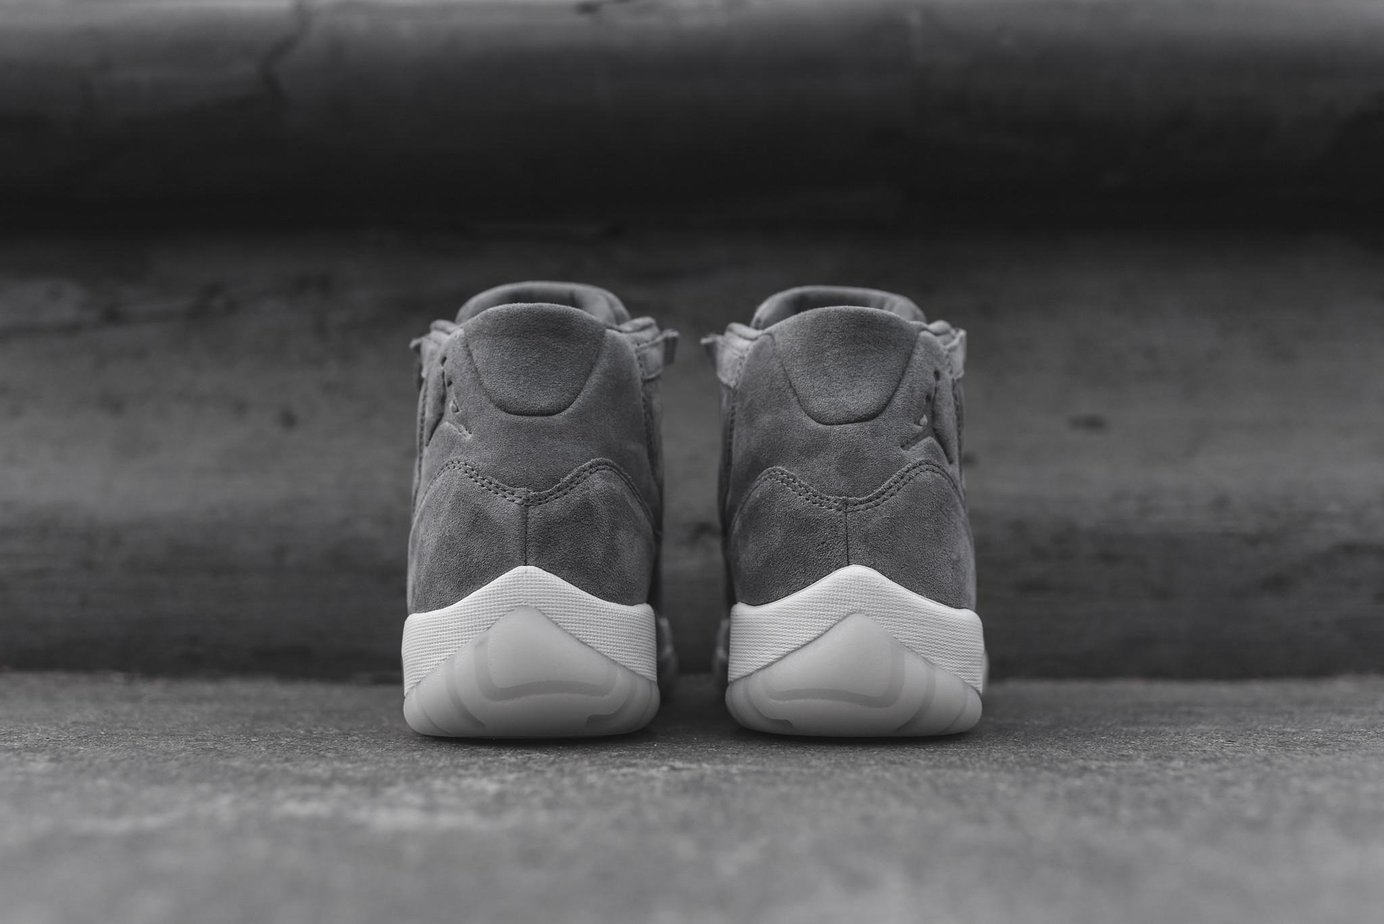 c9c4e82c0673 Air Jordan 11 Pinnacle Grey Suede Now Available - JustFreshKicks